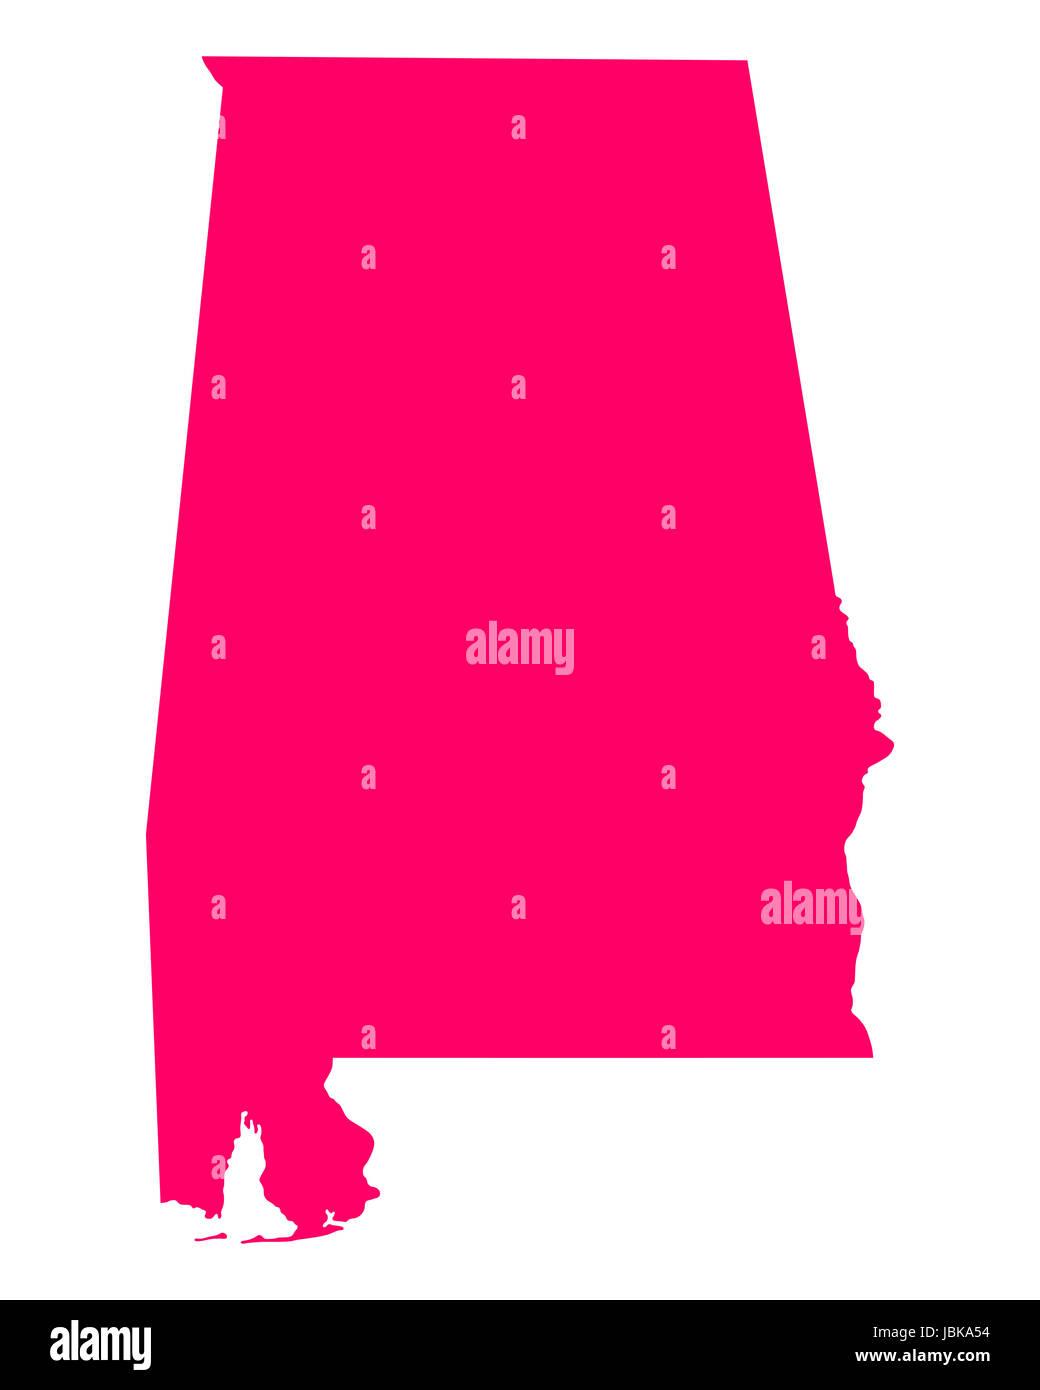 Karte von Alabama - Stock Image